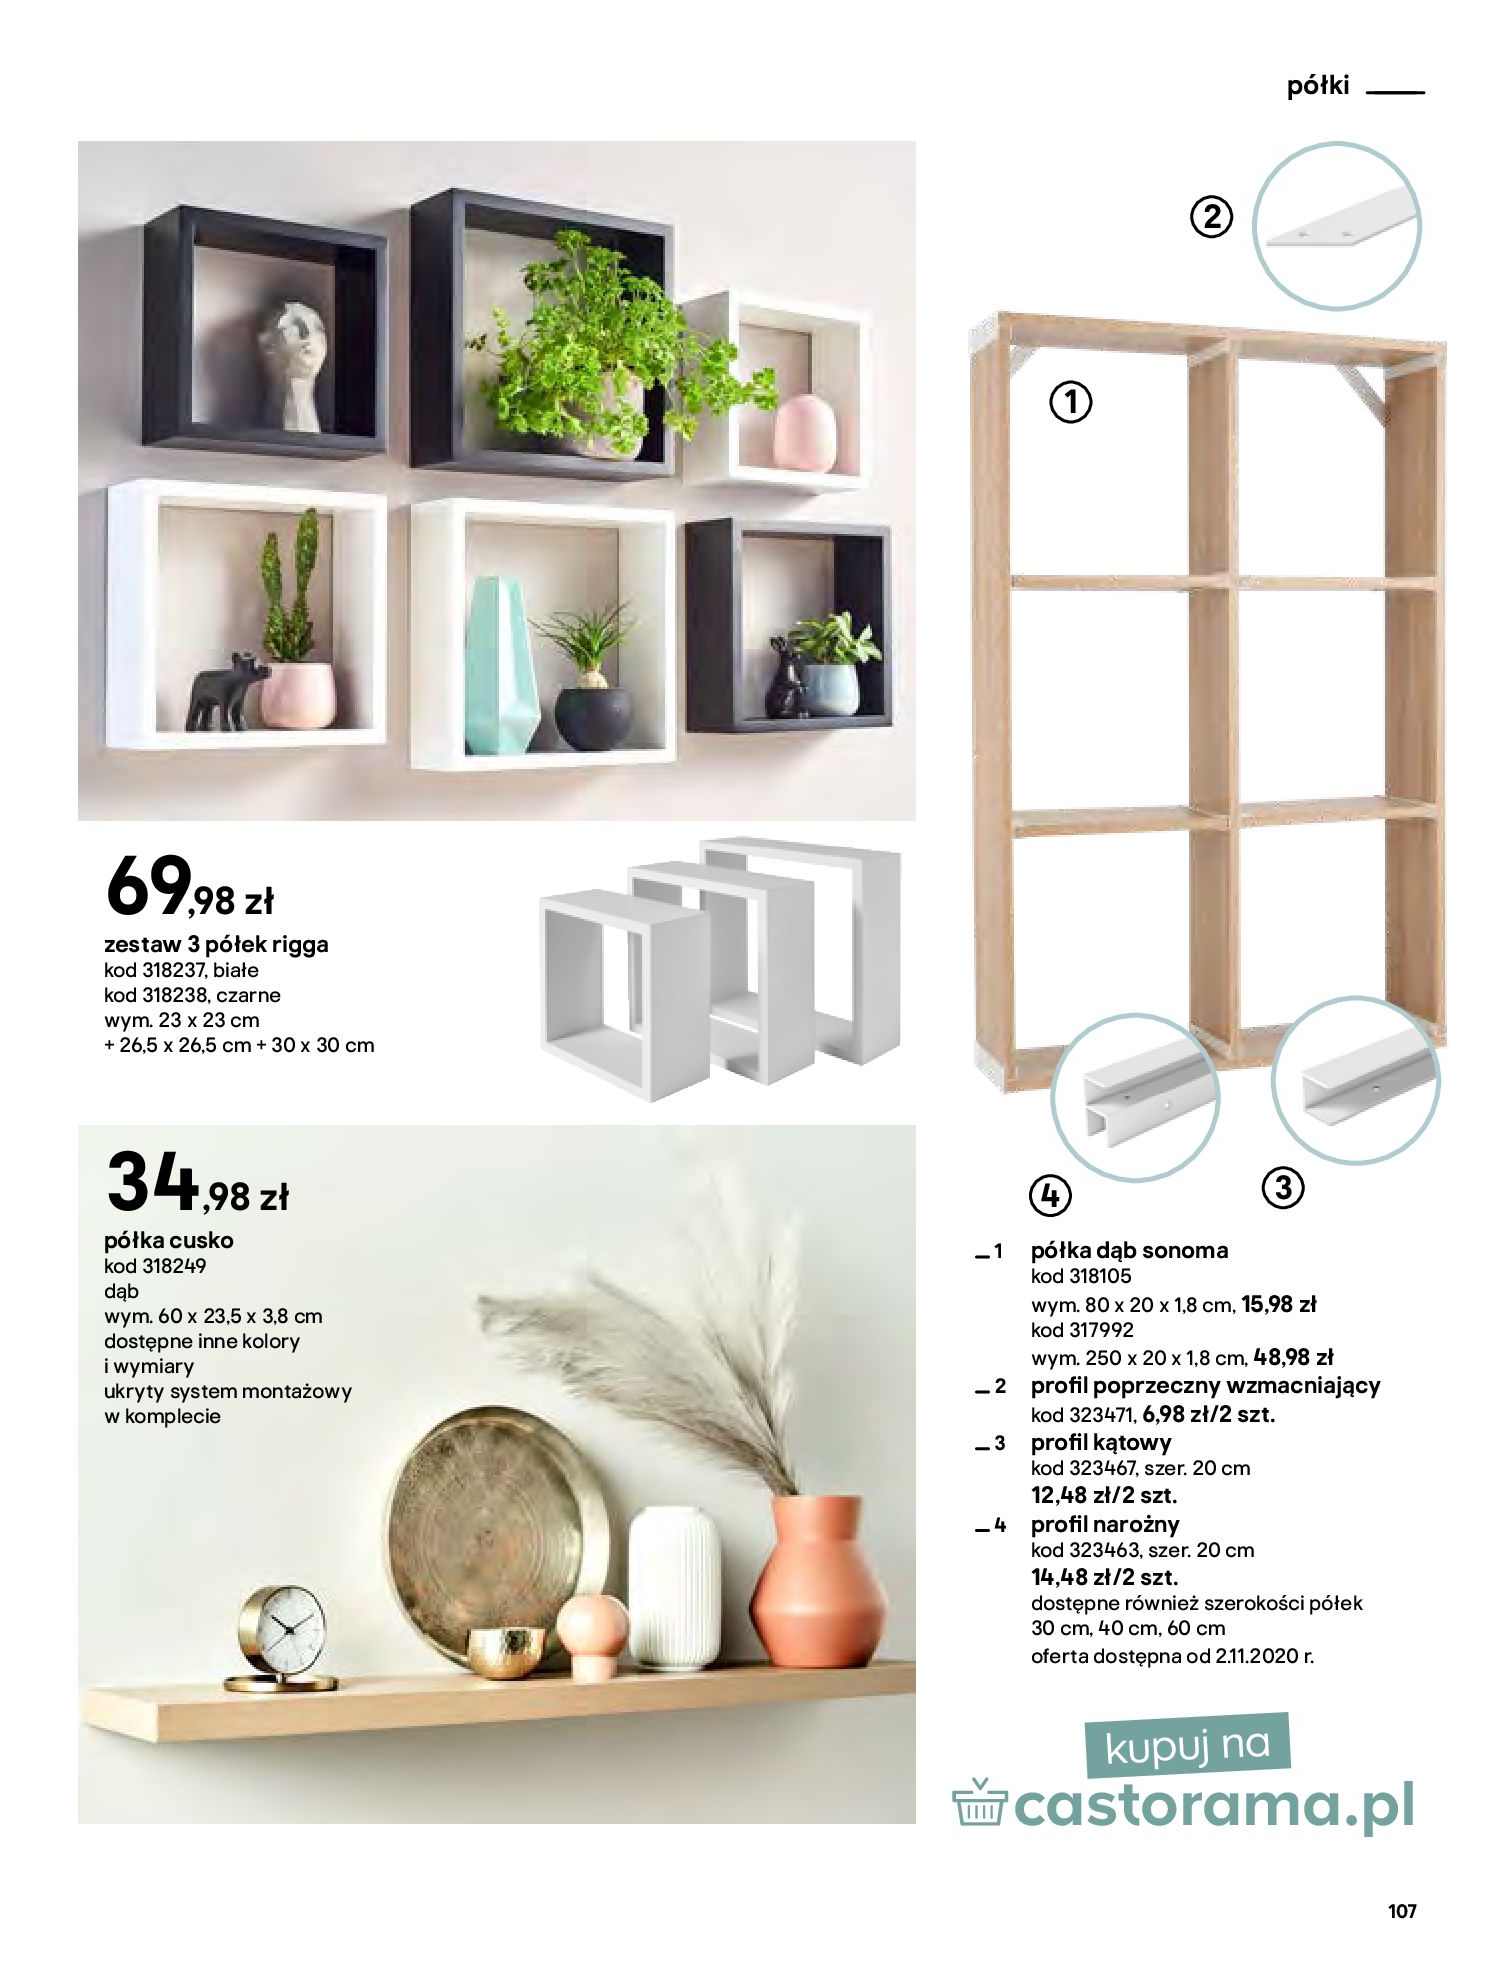 Gazetka Castorama - Katalog Dekoracje-22.10.2020-31.12.2020-page-107